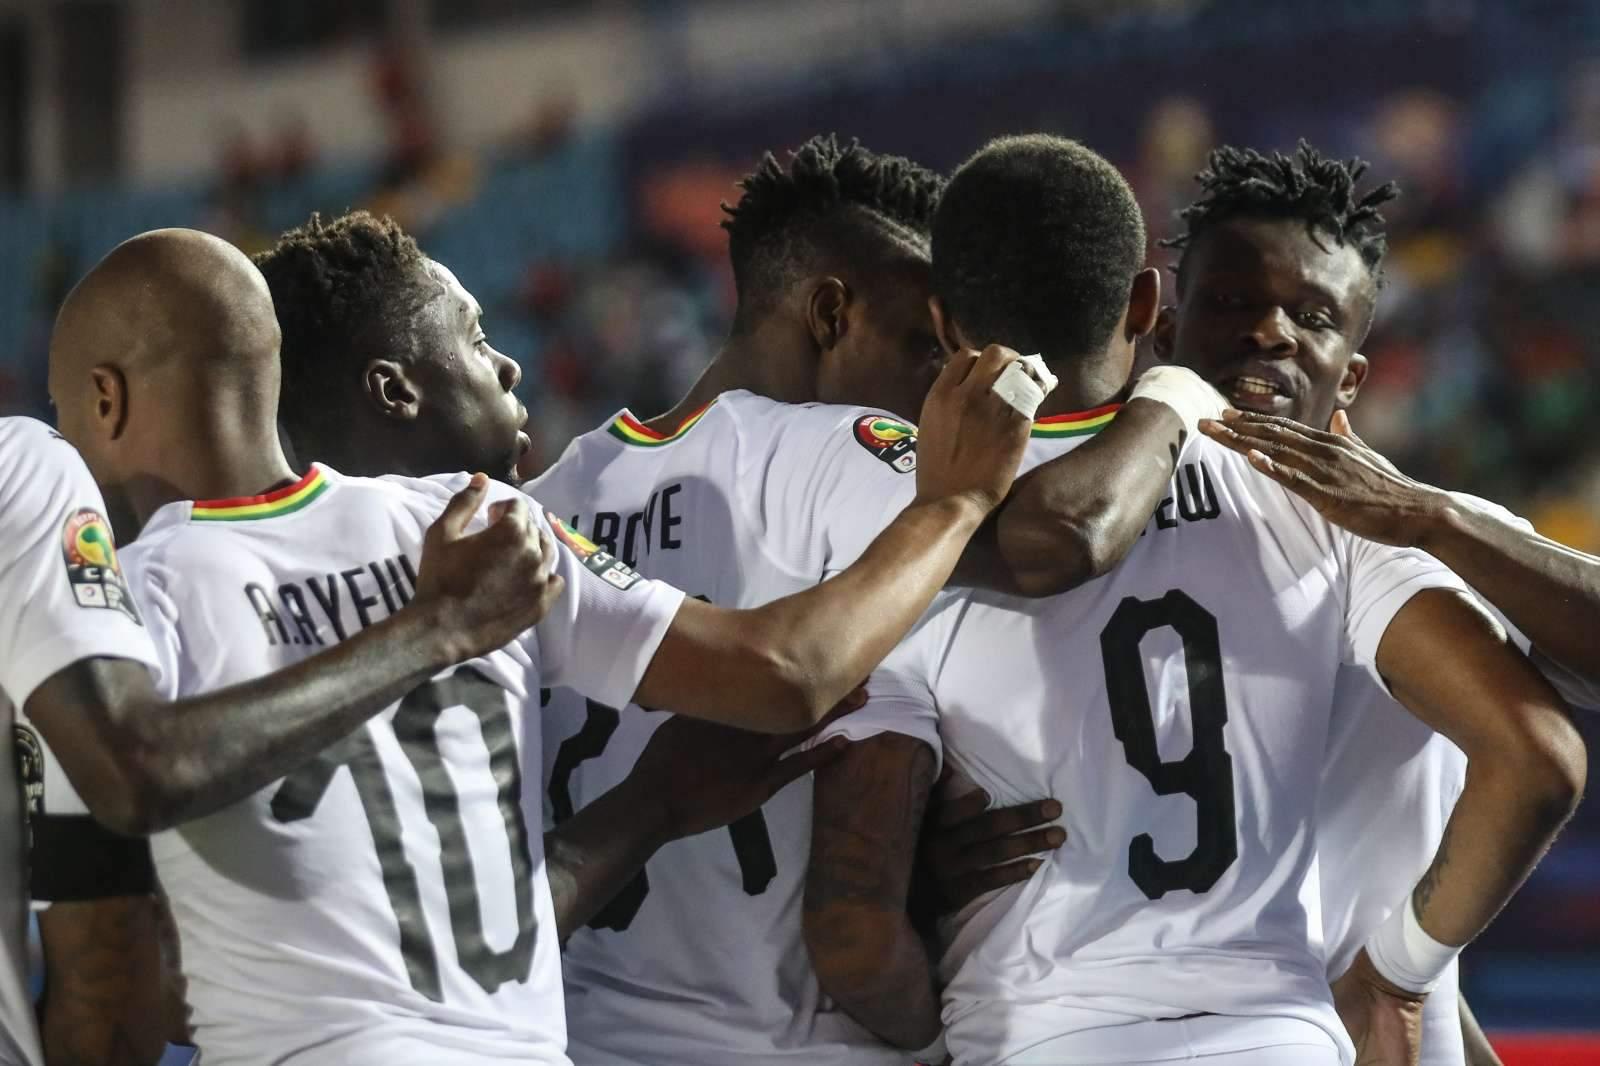 Зимбабве – Гана: прогноз на матч отборочного цикла чемпионата мира-2022 - 12 октября 2021